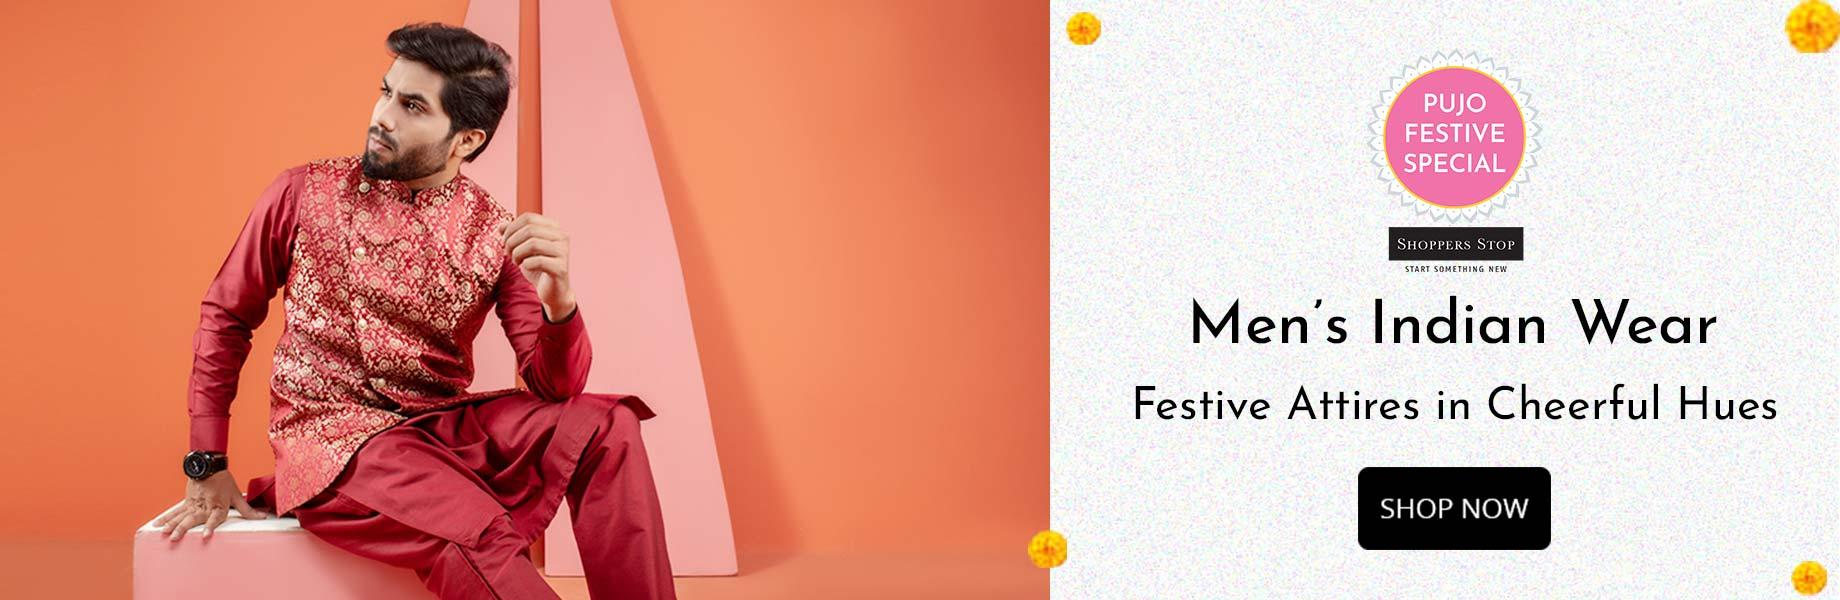 mensIndianwear_web.jpg